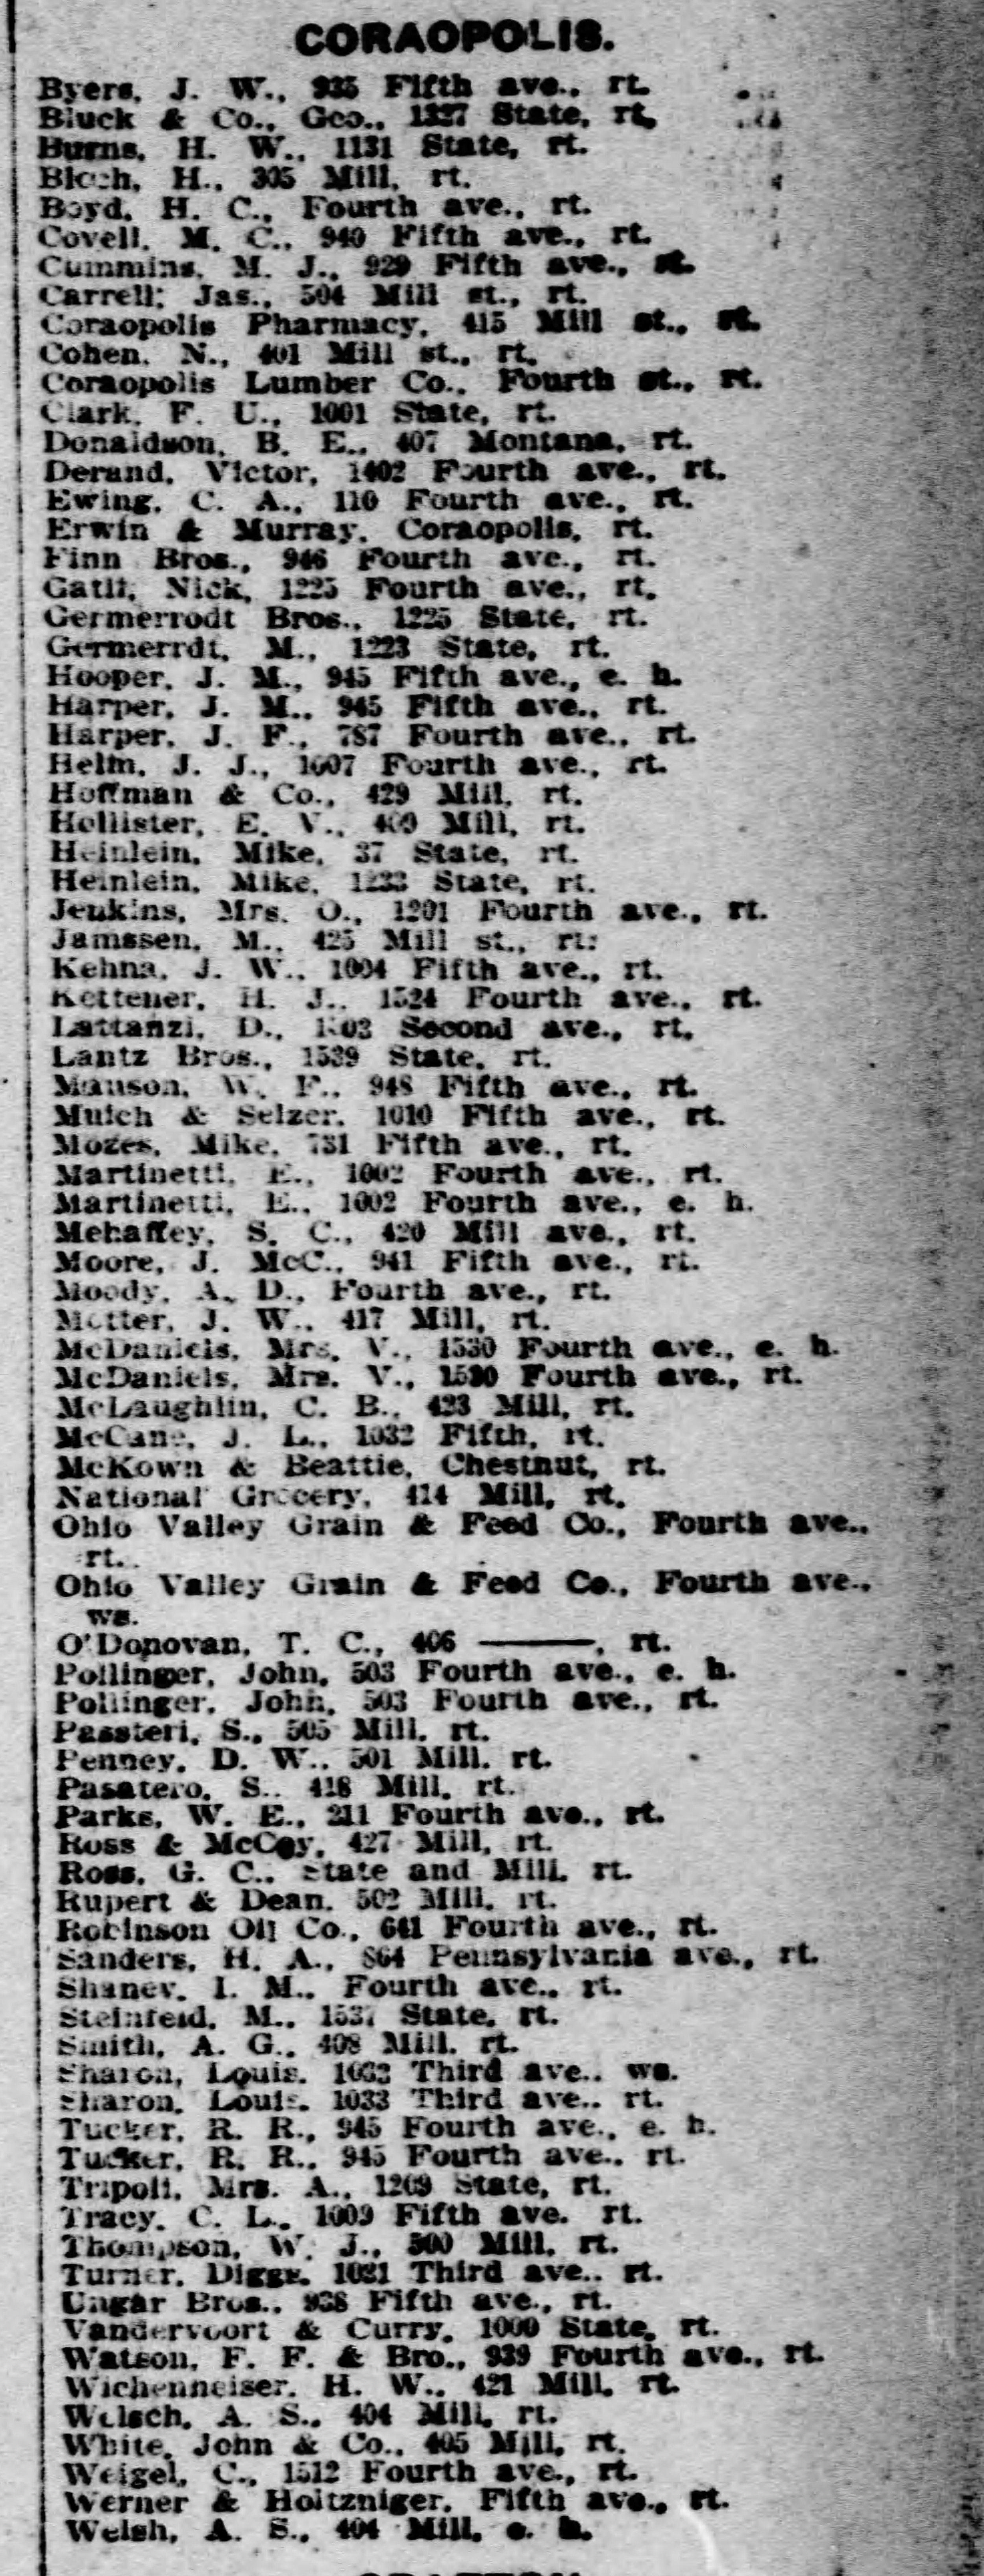 1912 - Pittsburgh_Daily_Post_Fri__Apr_19__1912_(2).jpg